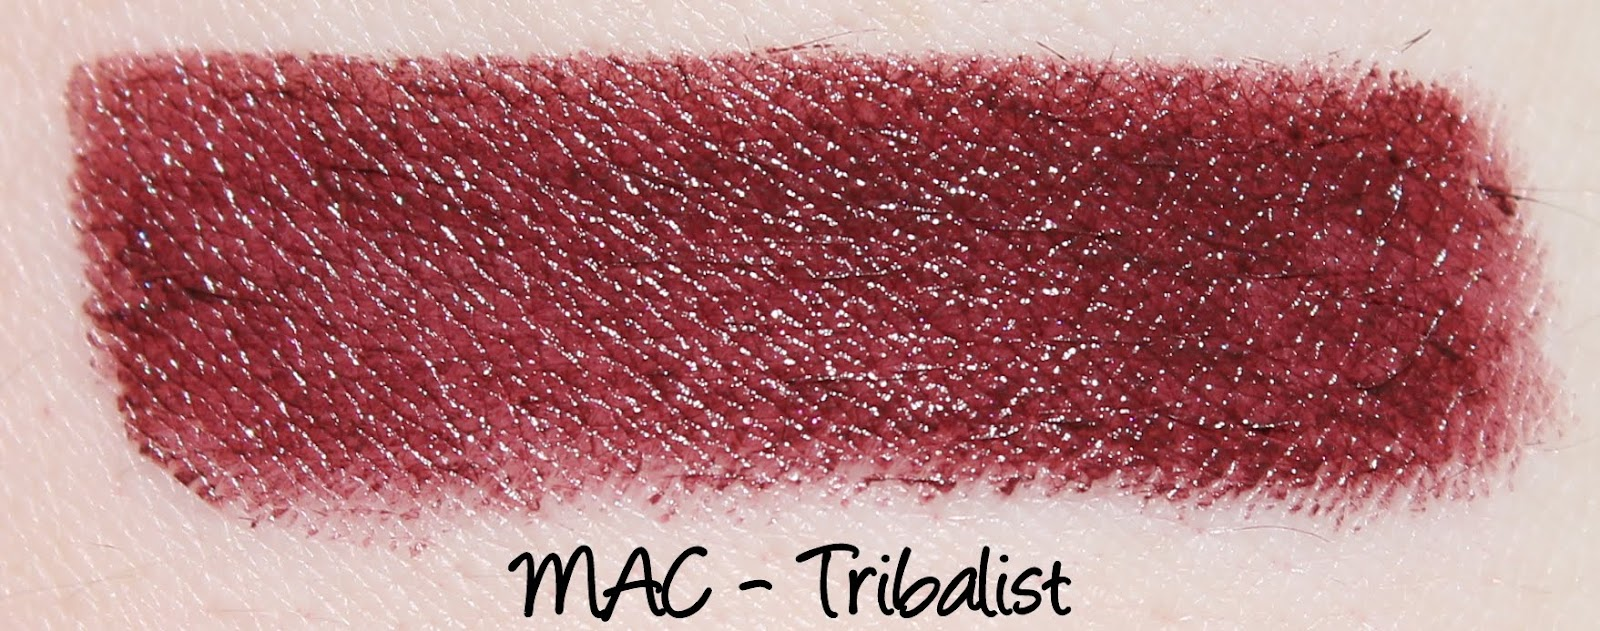 MAC Heirloom Mix Lipsticks - Tribalist Swatches & Review